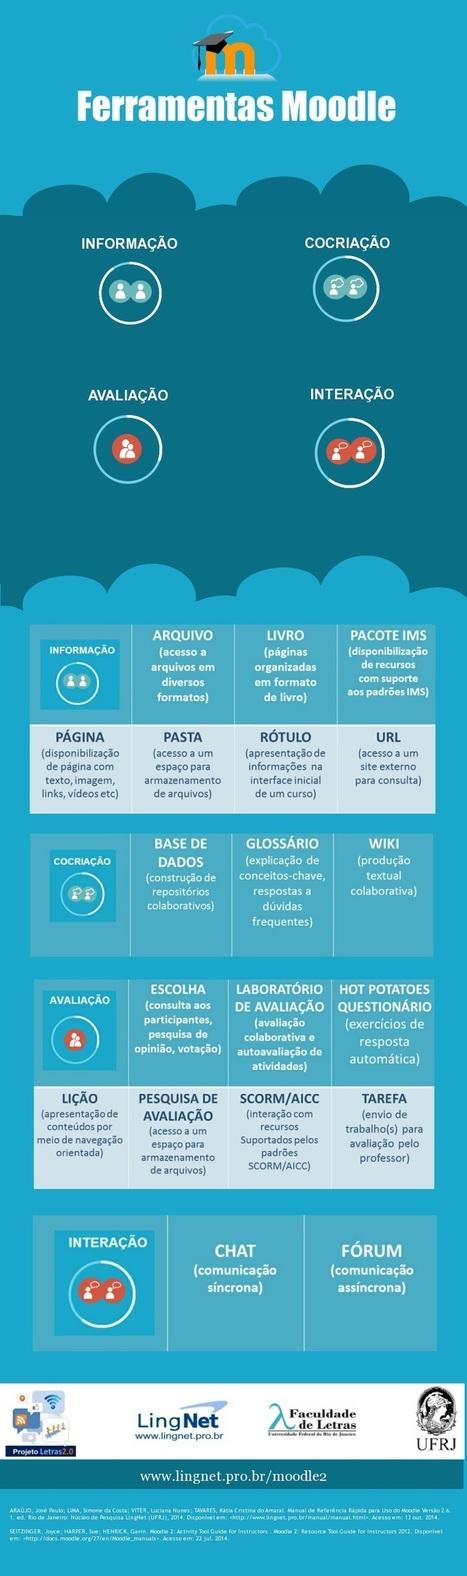 Infográfico: Ferramentas Moodle | Historia e Tecnologia | Scoop.it